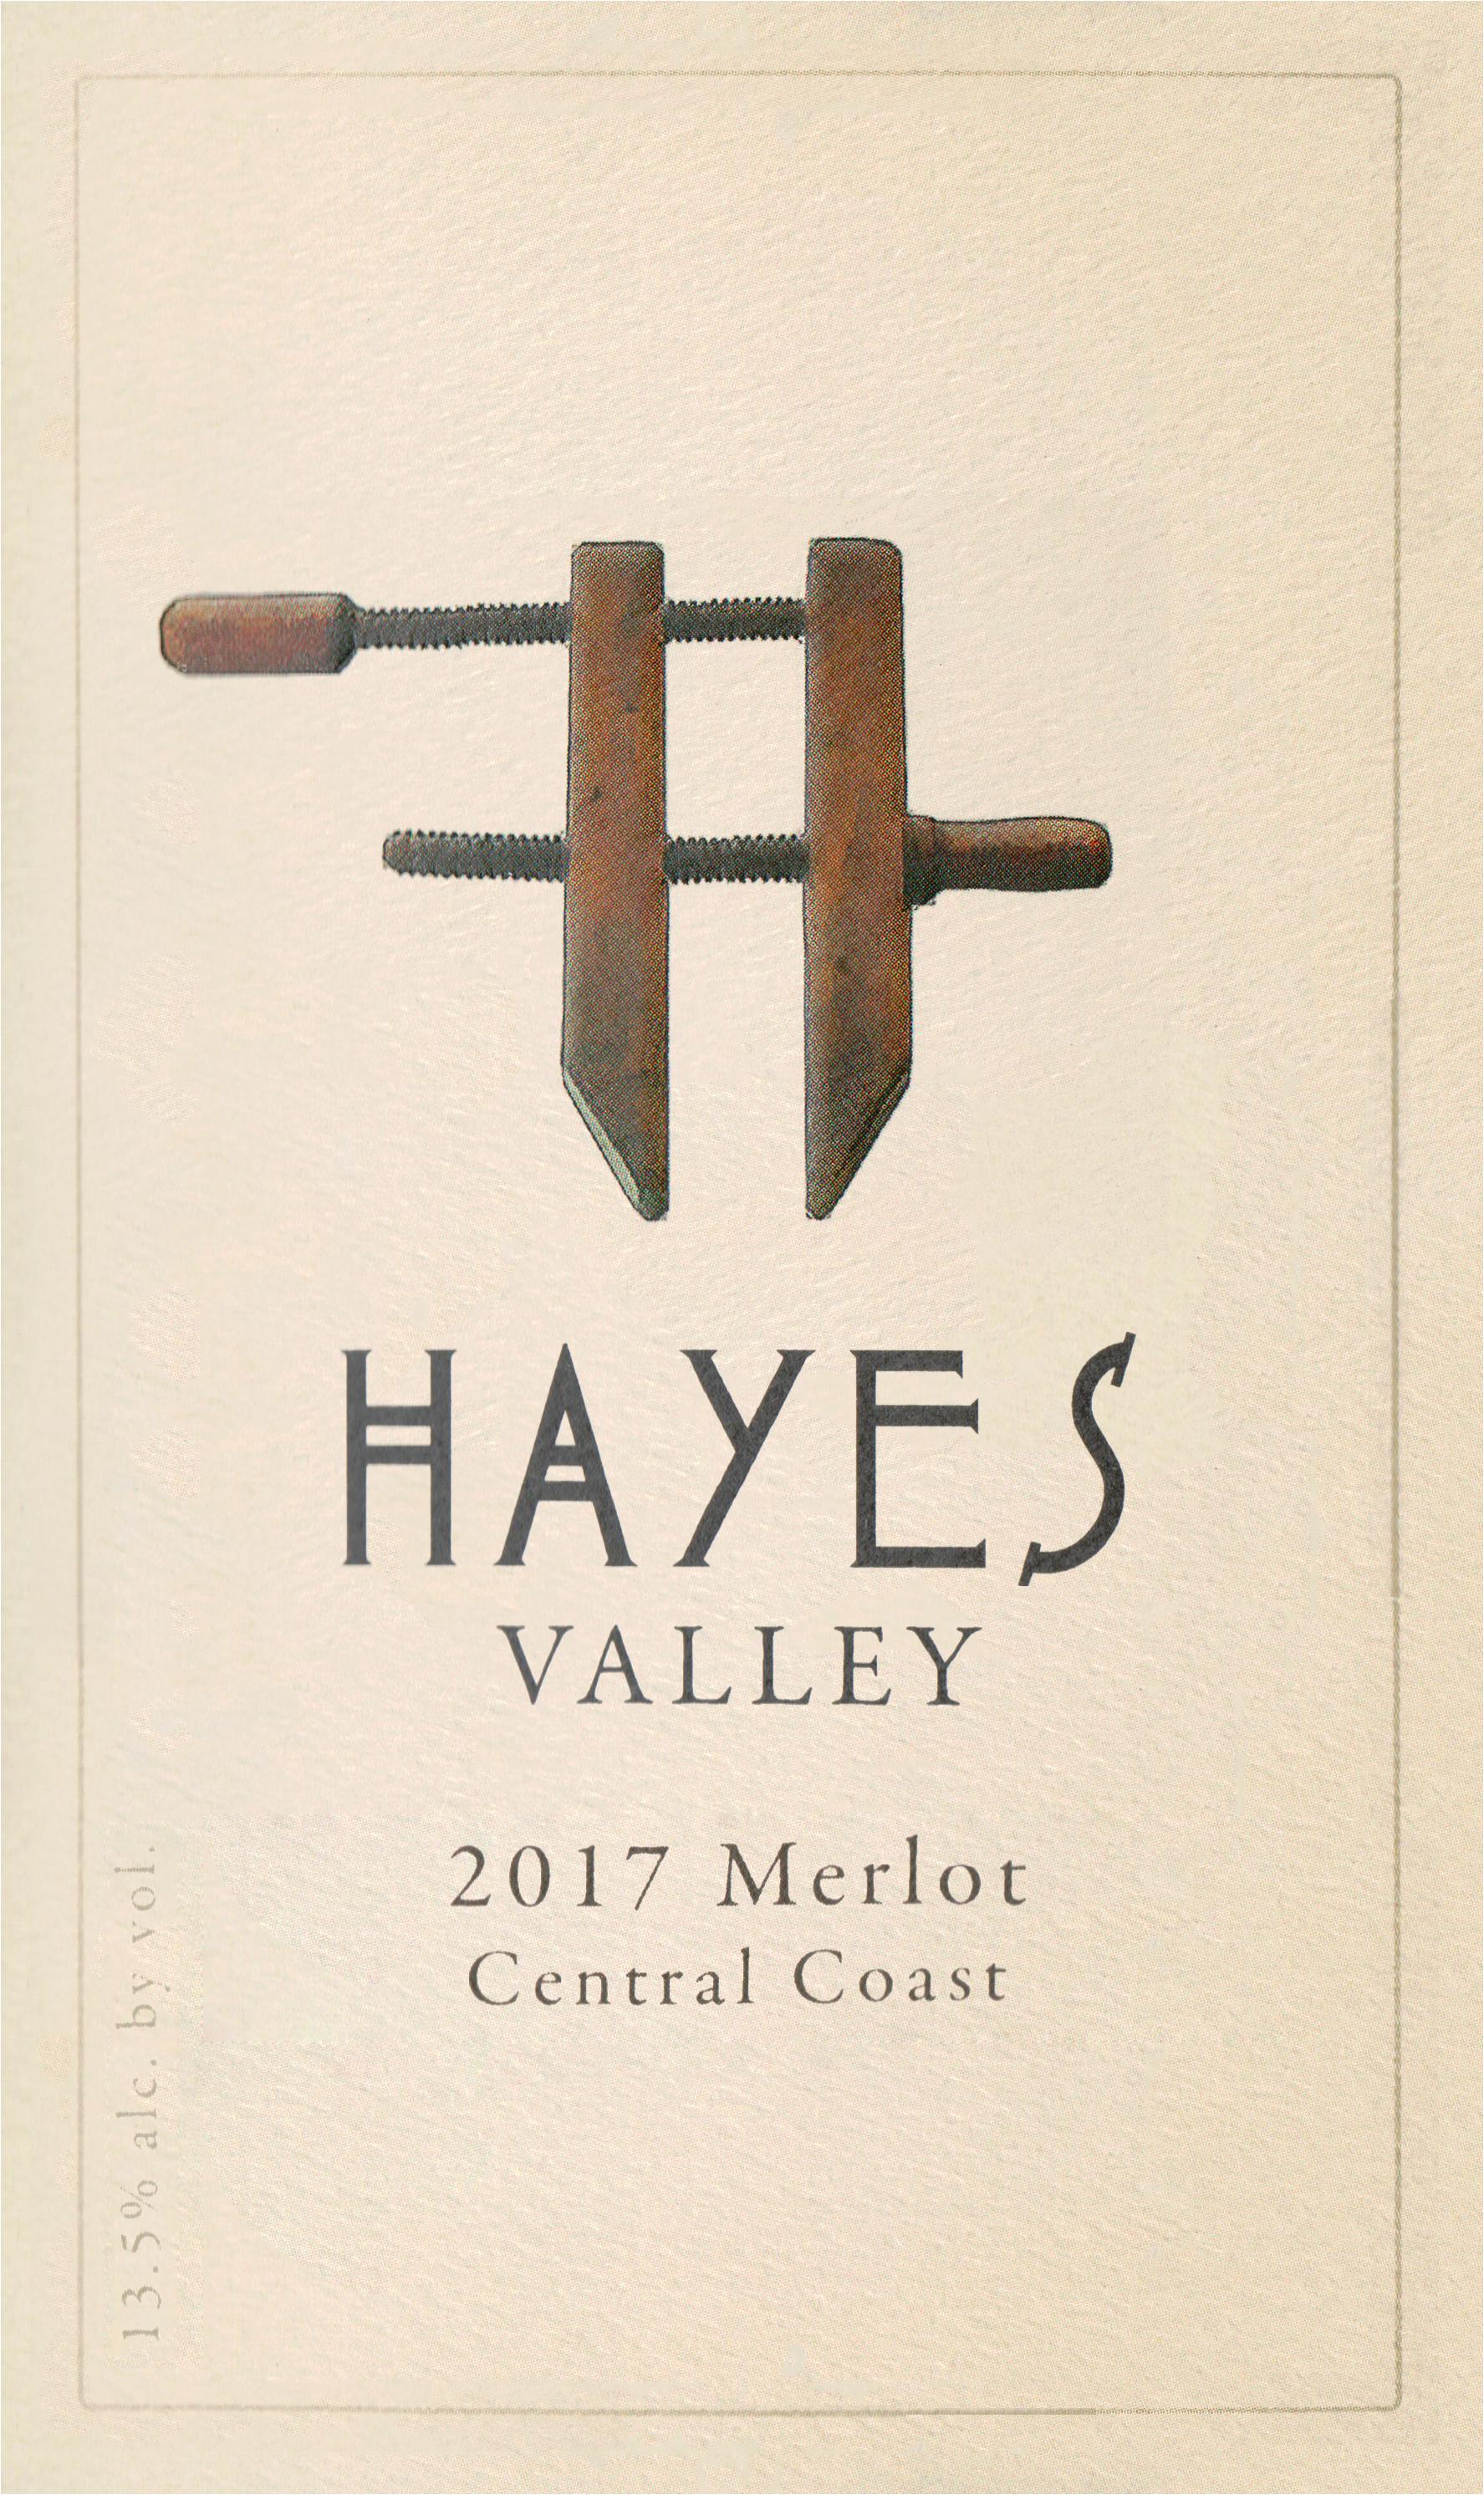 Hayes Valley Merlot Central Coast 2017